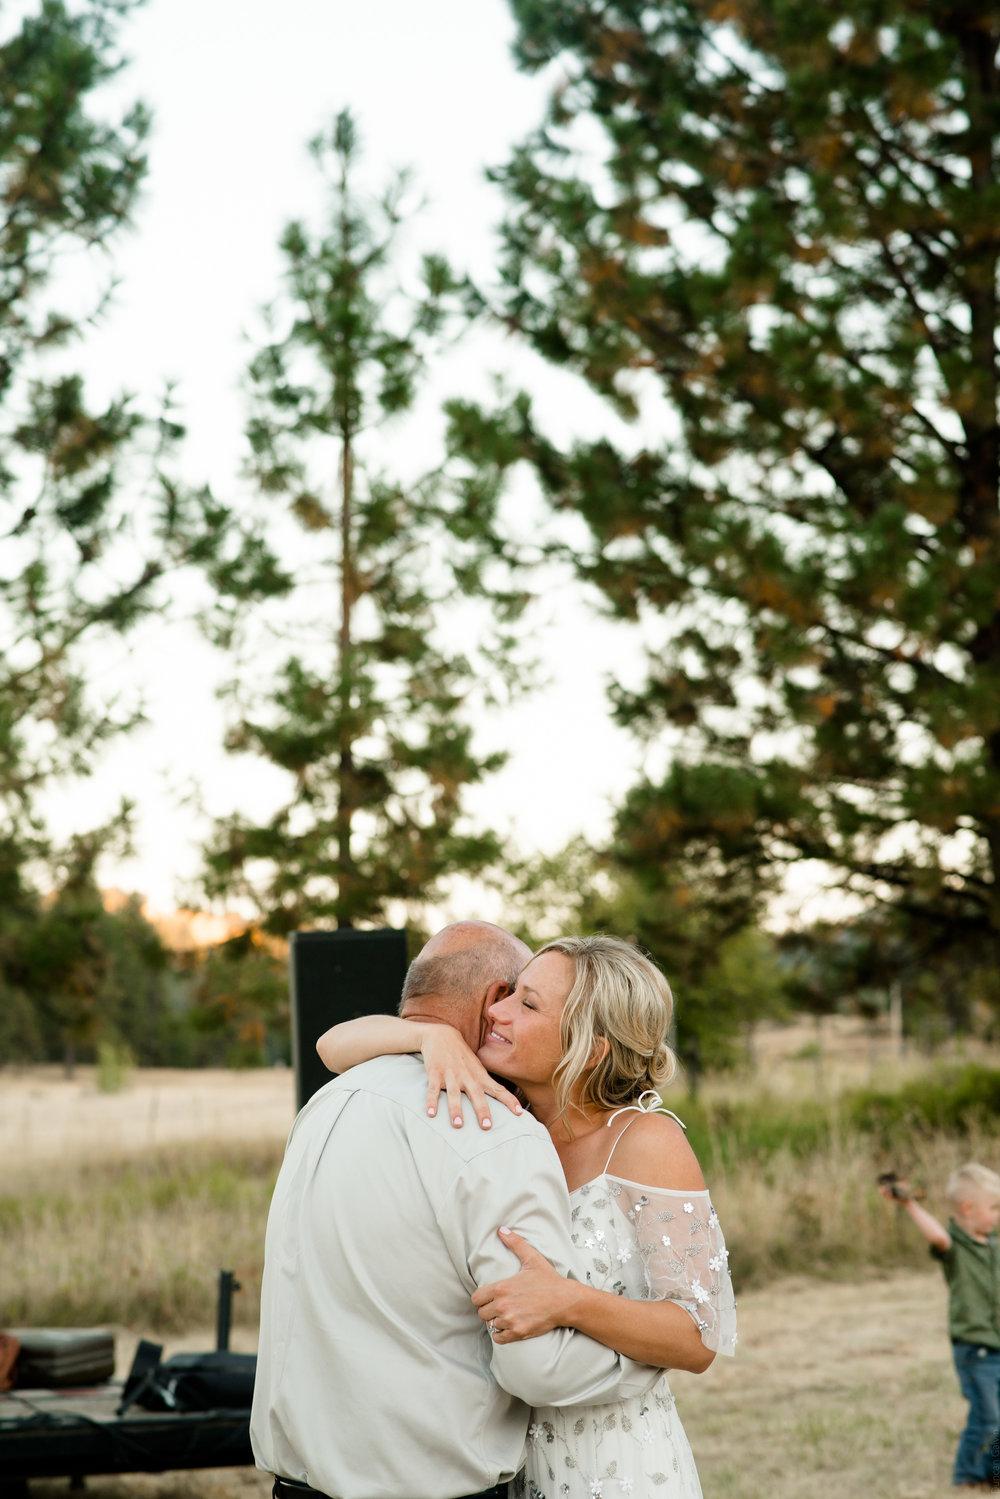 Lana Micah Wedding La Grande Oregon September 2018 Please Credit Talia Jean Galvin (545 of 687).jpg